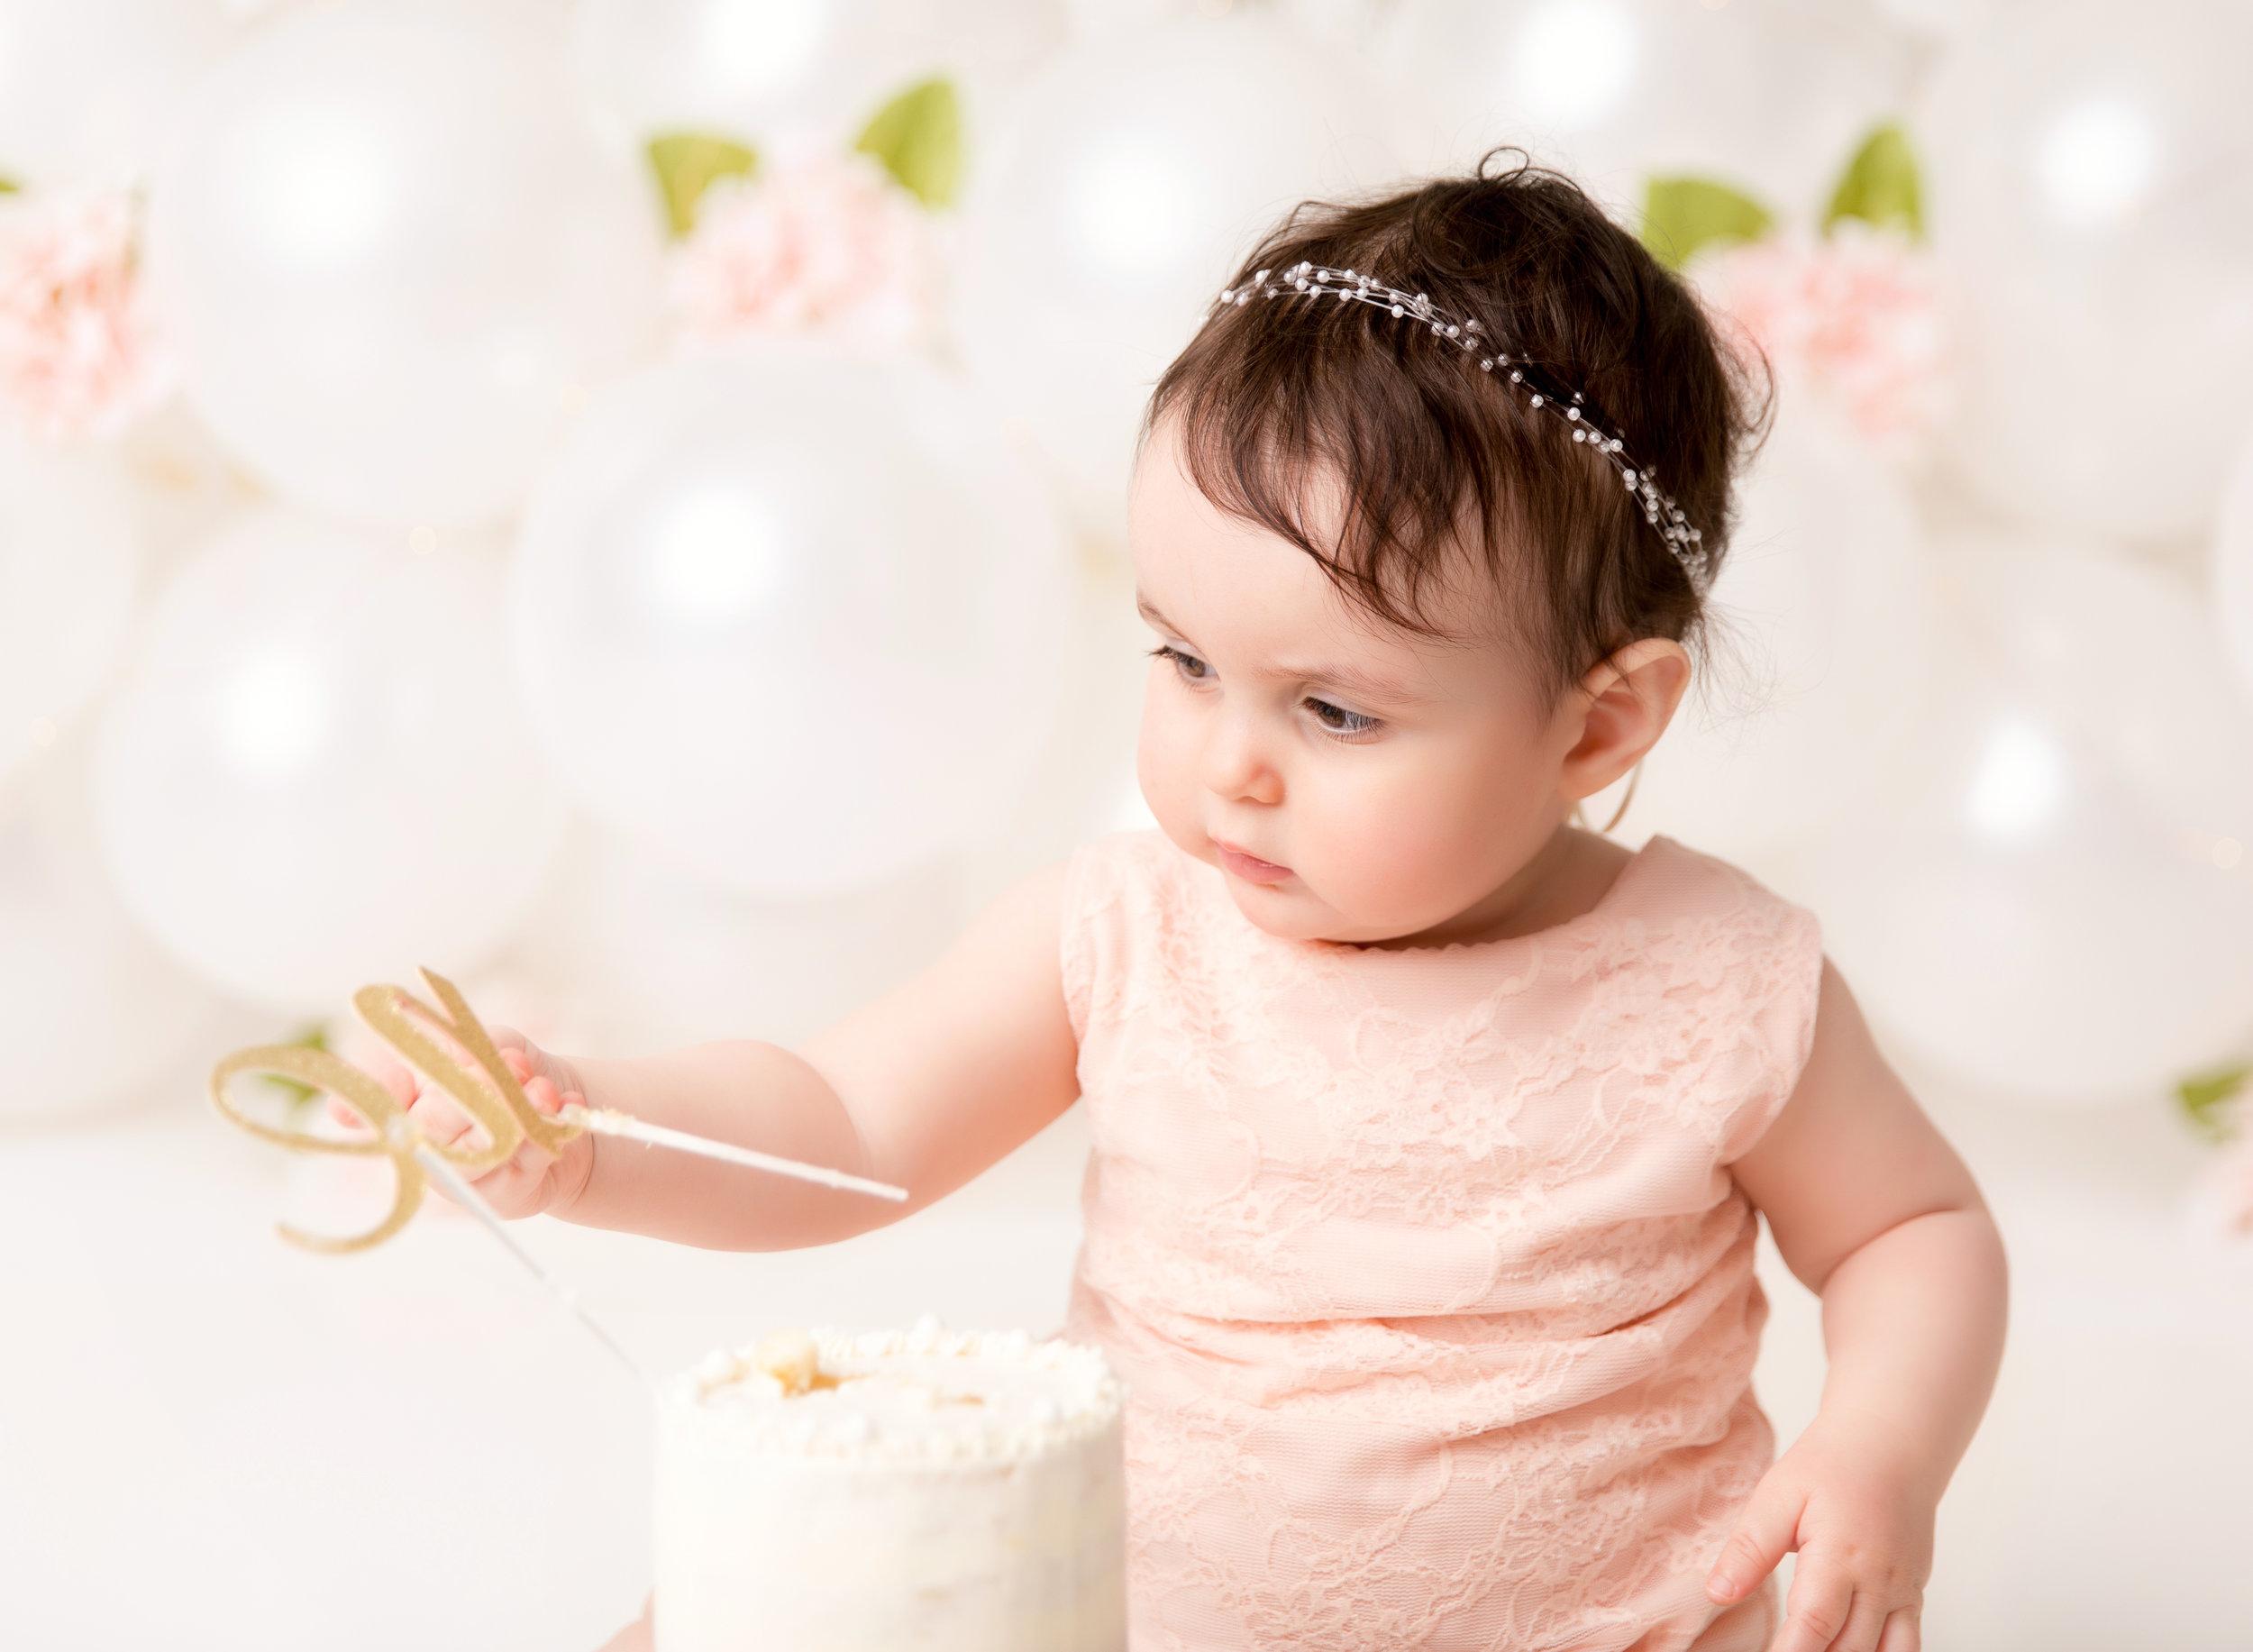 CakeSmashEliana10LucianaGolcman.jpg